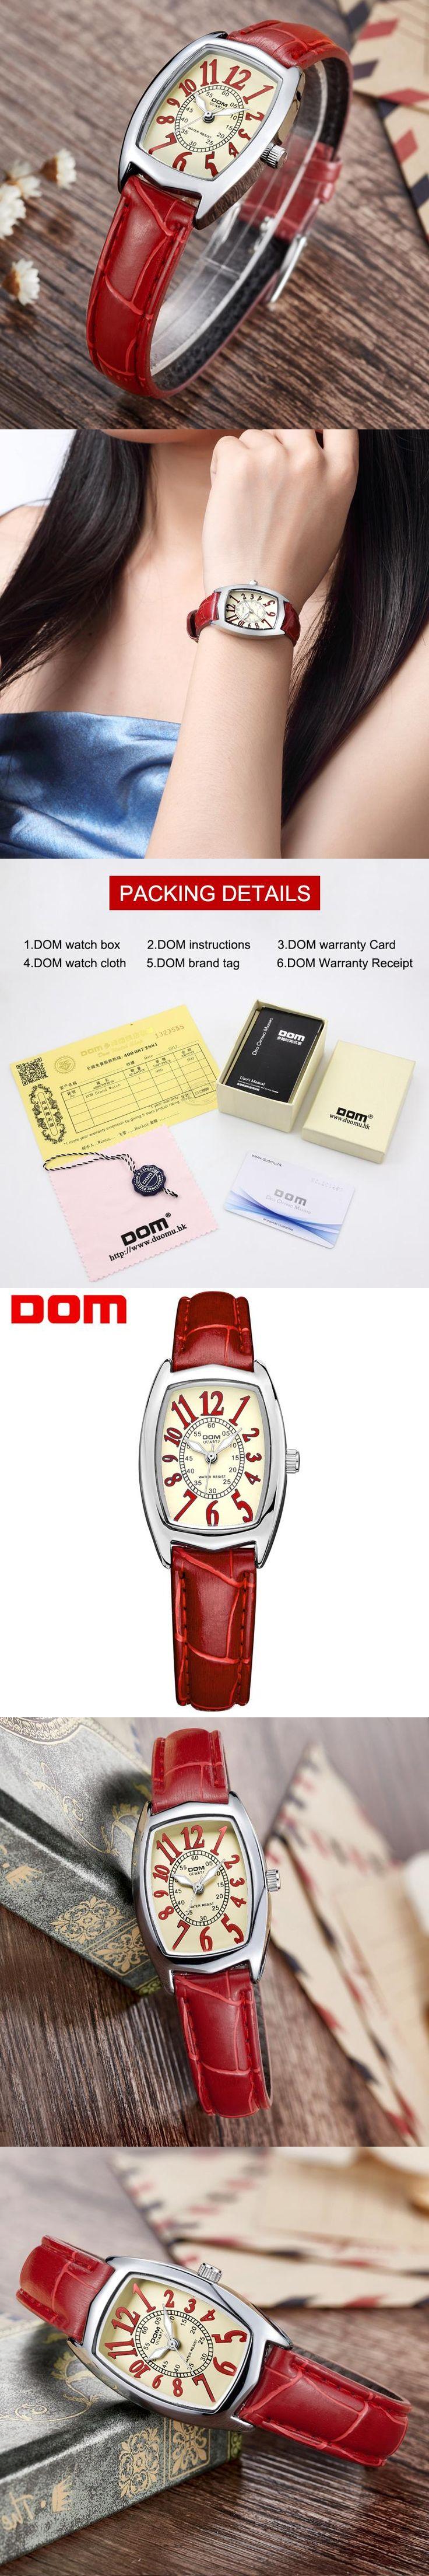 DOM women watches Brand waterproof style Fashion dress ladies Watches Leather women Quartz Wrist Watch relojes mujer LP-1208L-4M